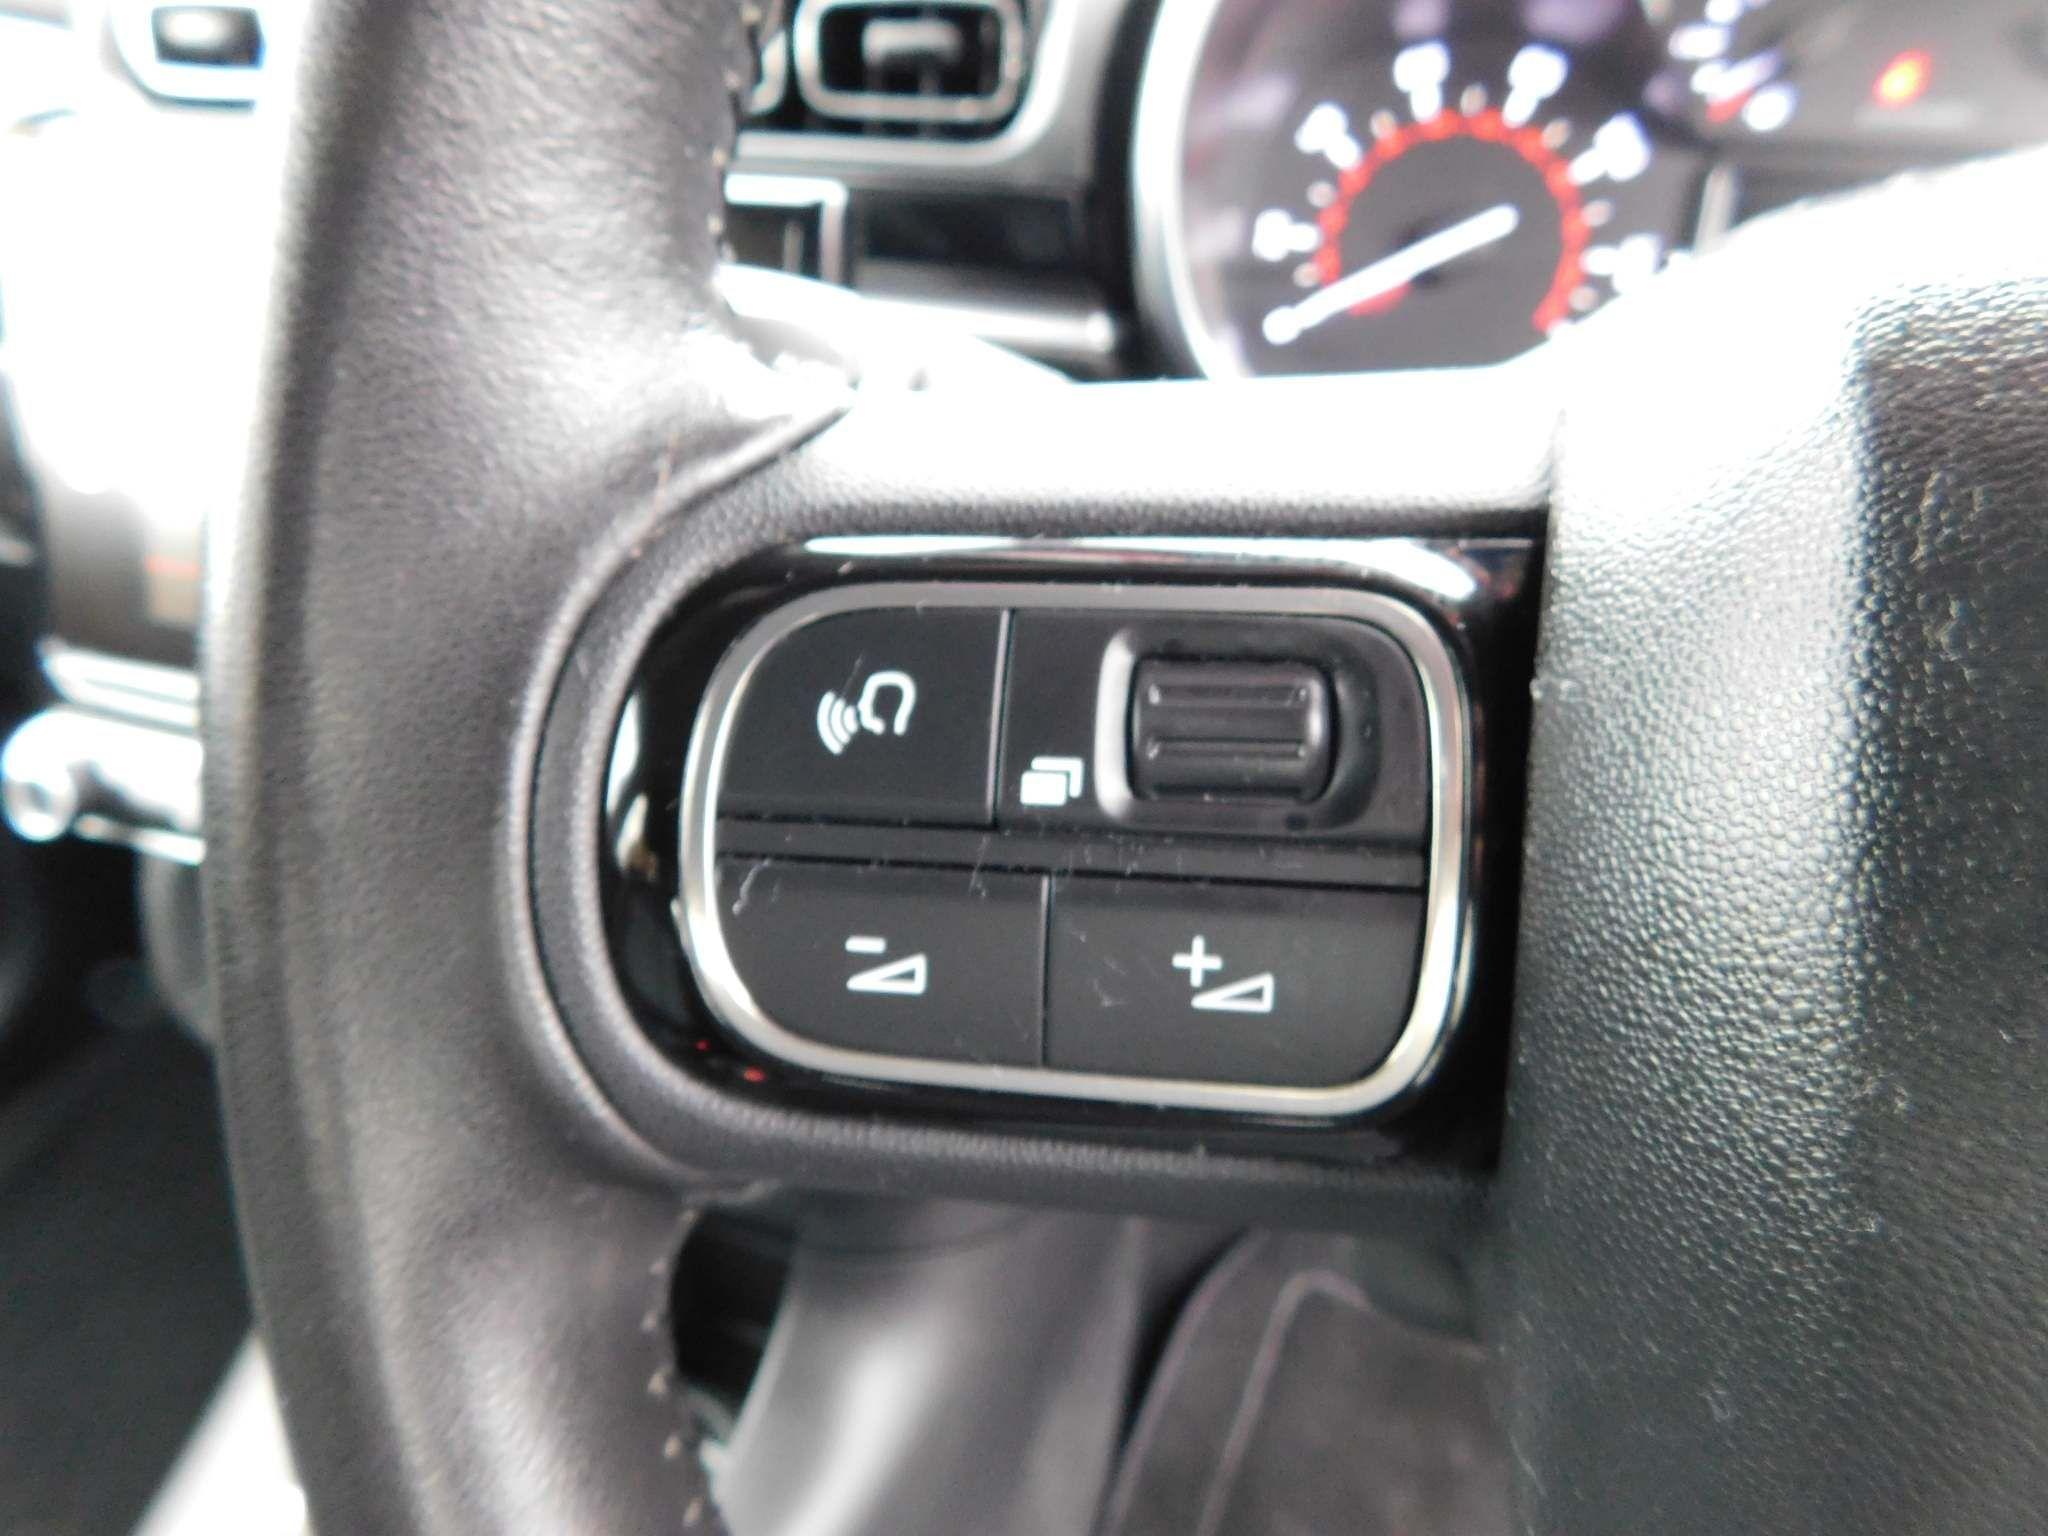 2017 CITROEN C3 1.6 BlueHDi Flair (s/s) Diesel Manual just arrived – Meadow Cars Carrickfergus full